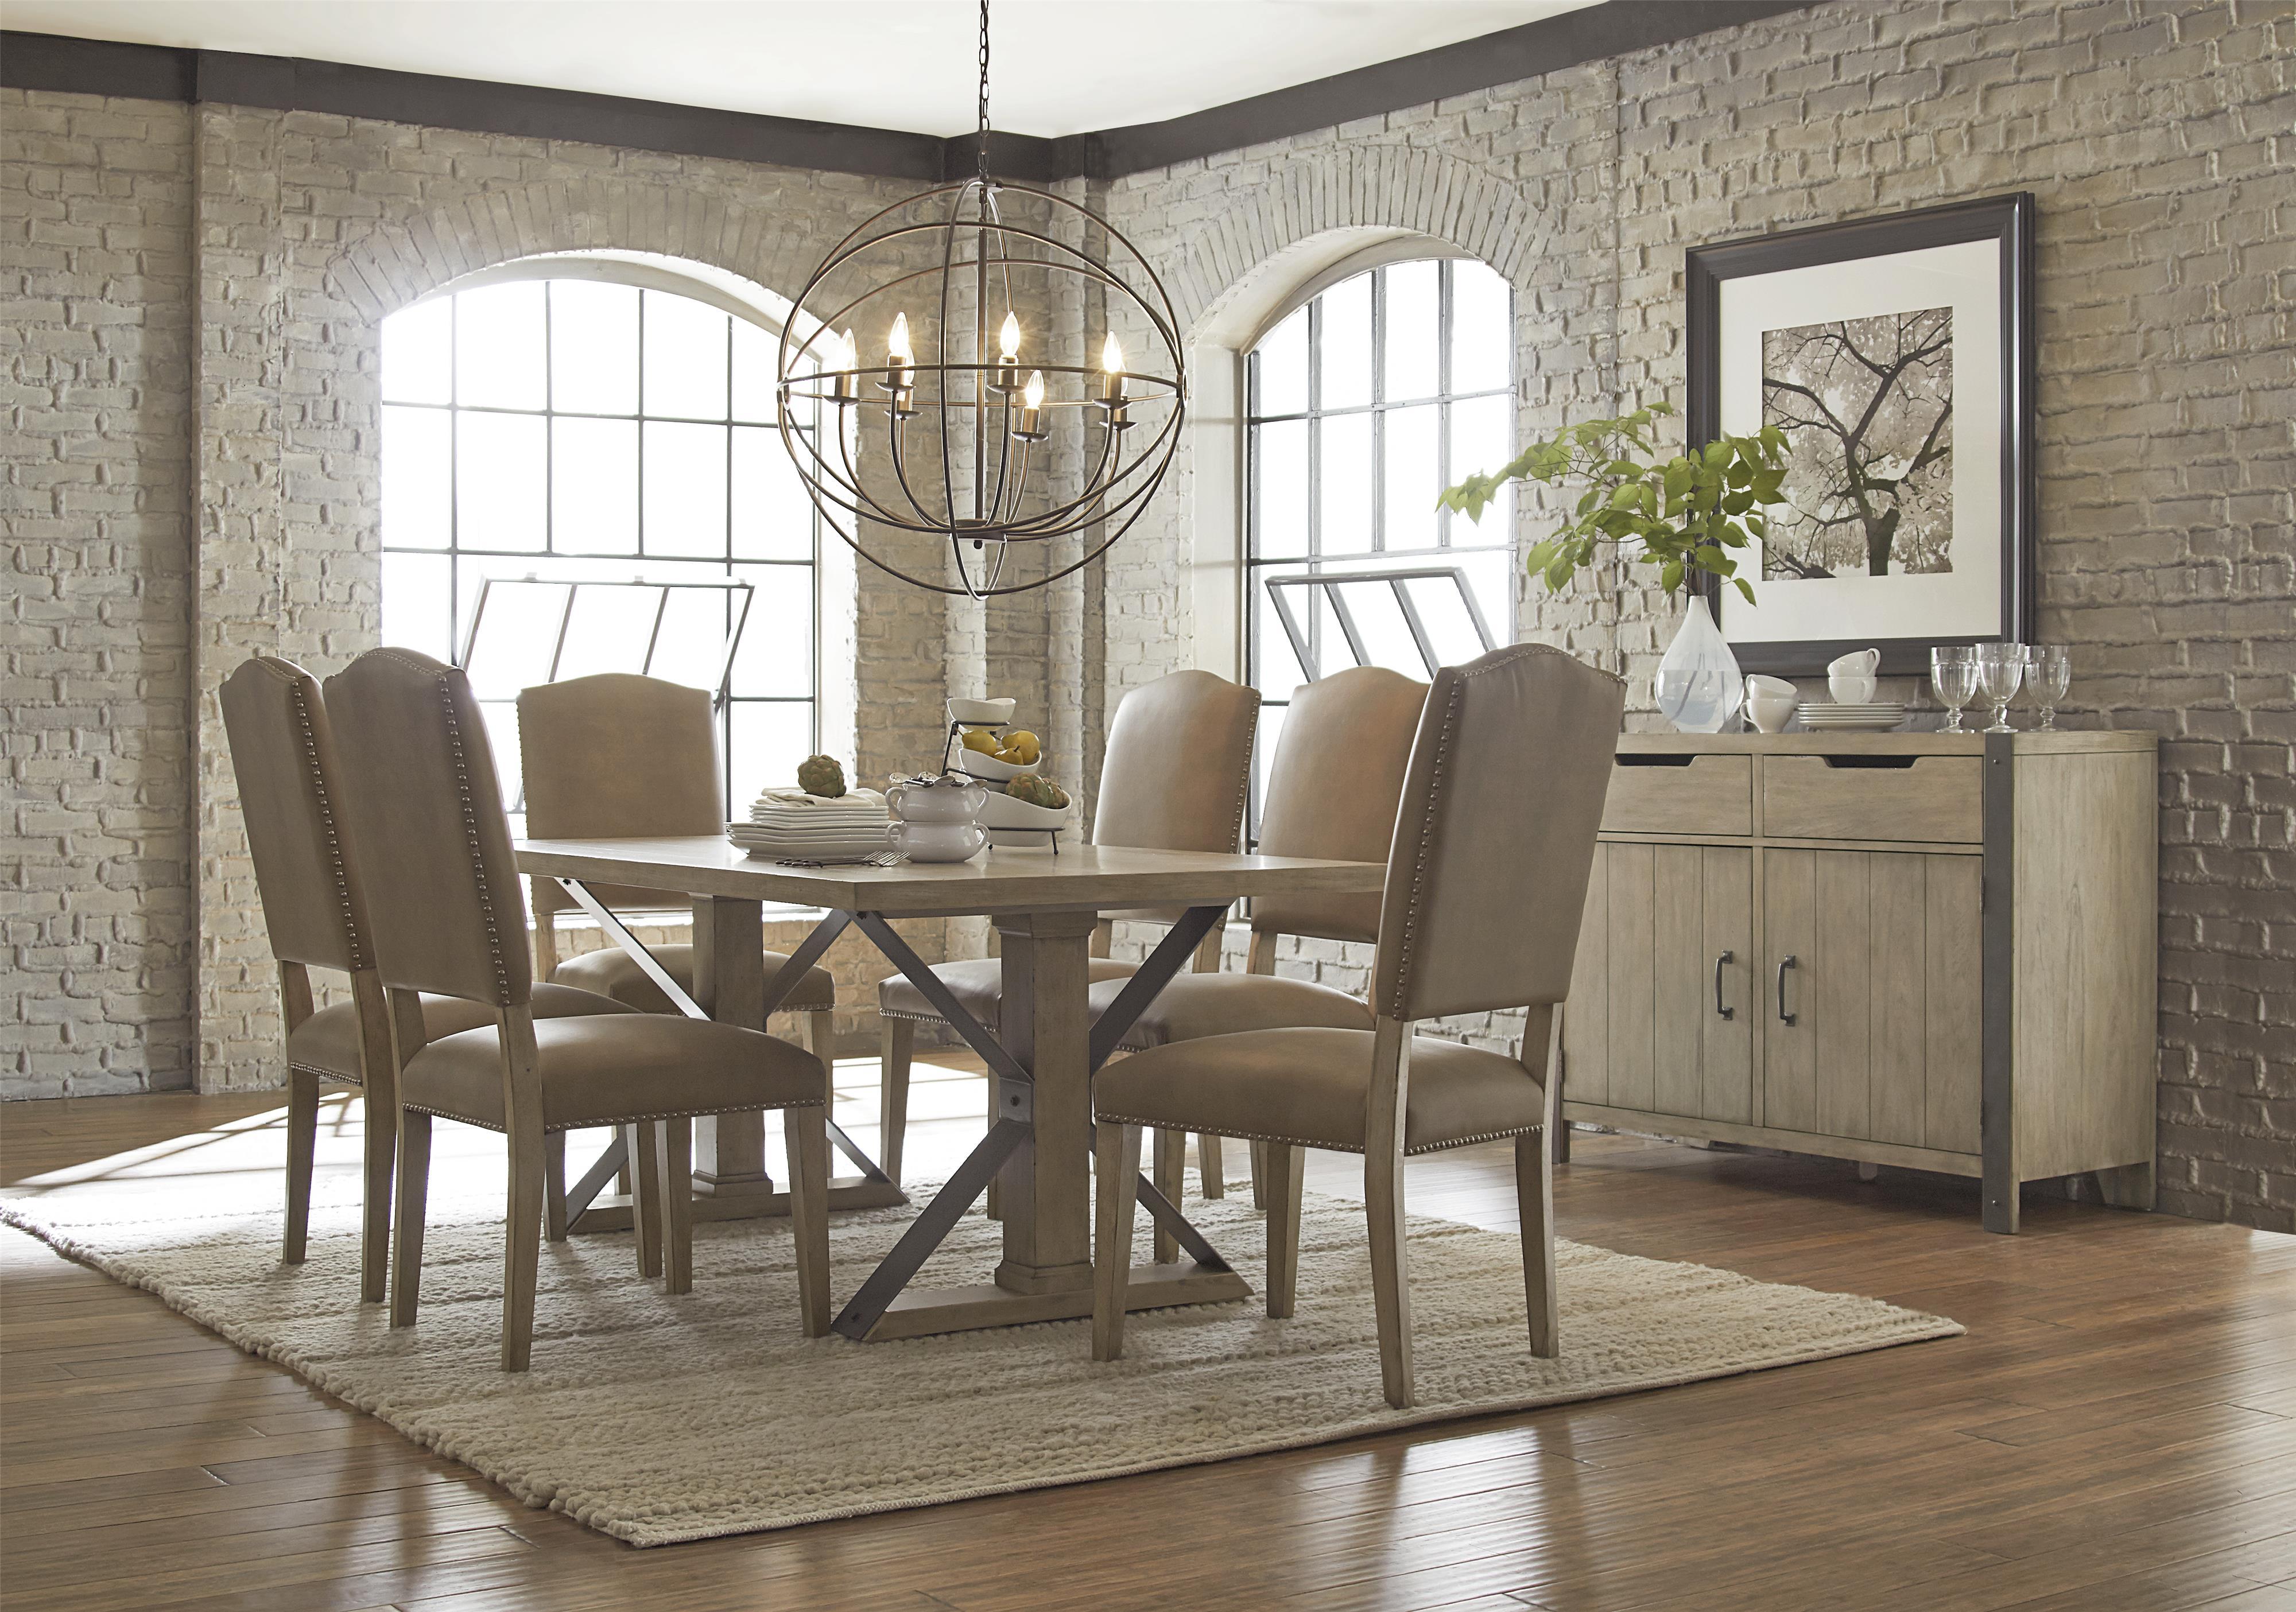 Progressive Furniture Shenandoah Casual Dining Room Group - Item Number: P870-10+6x61+83